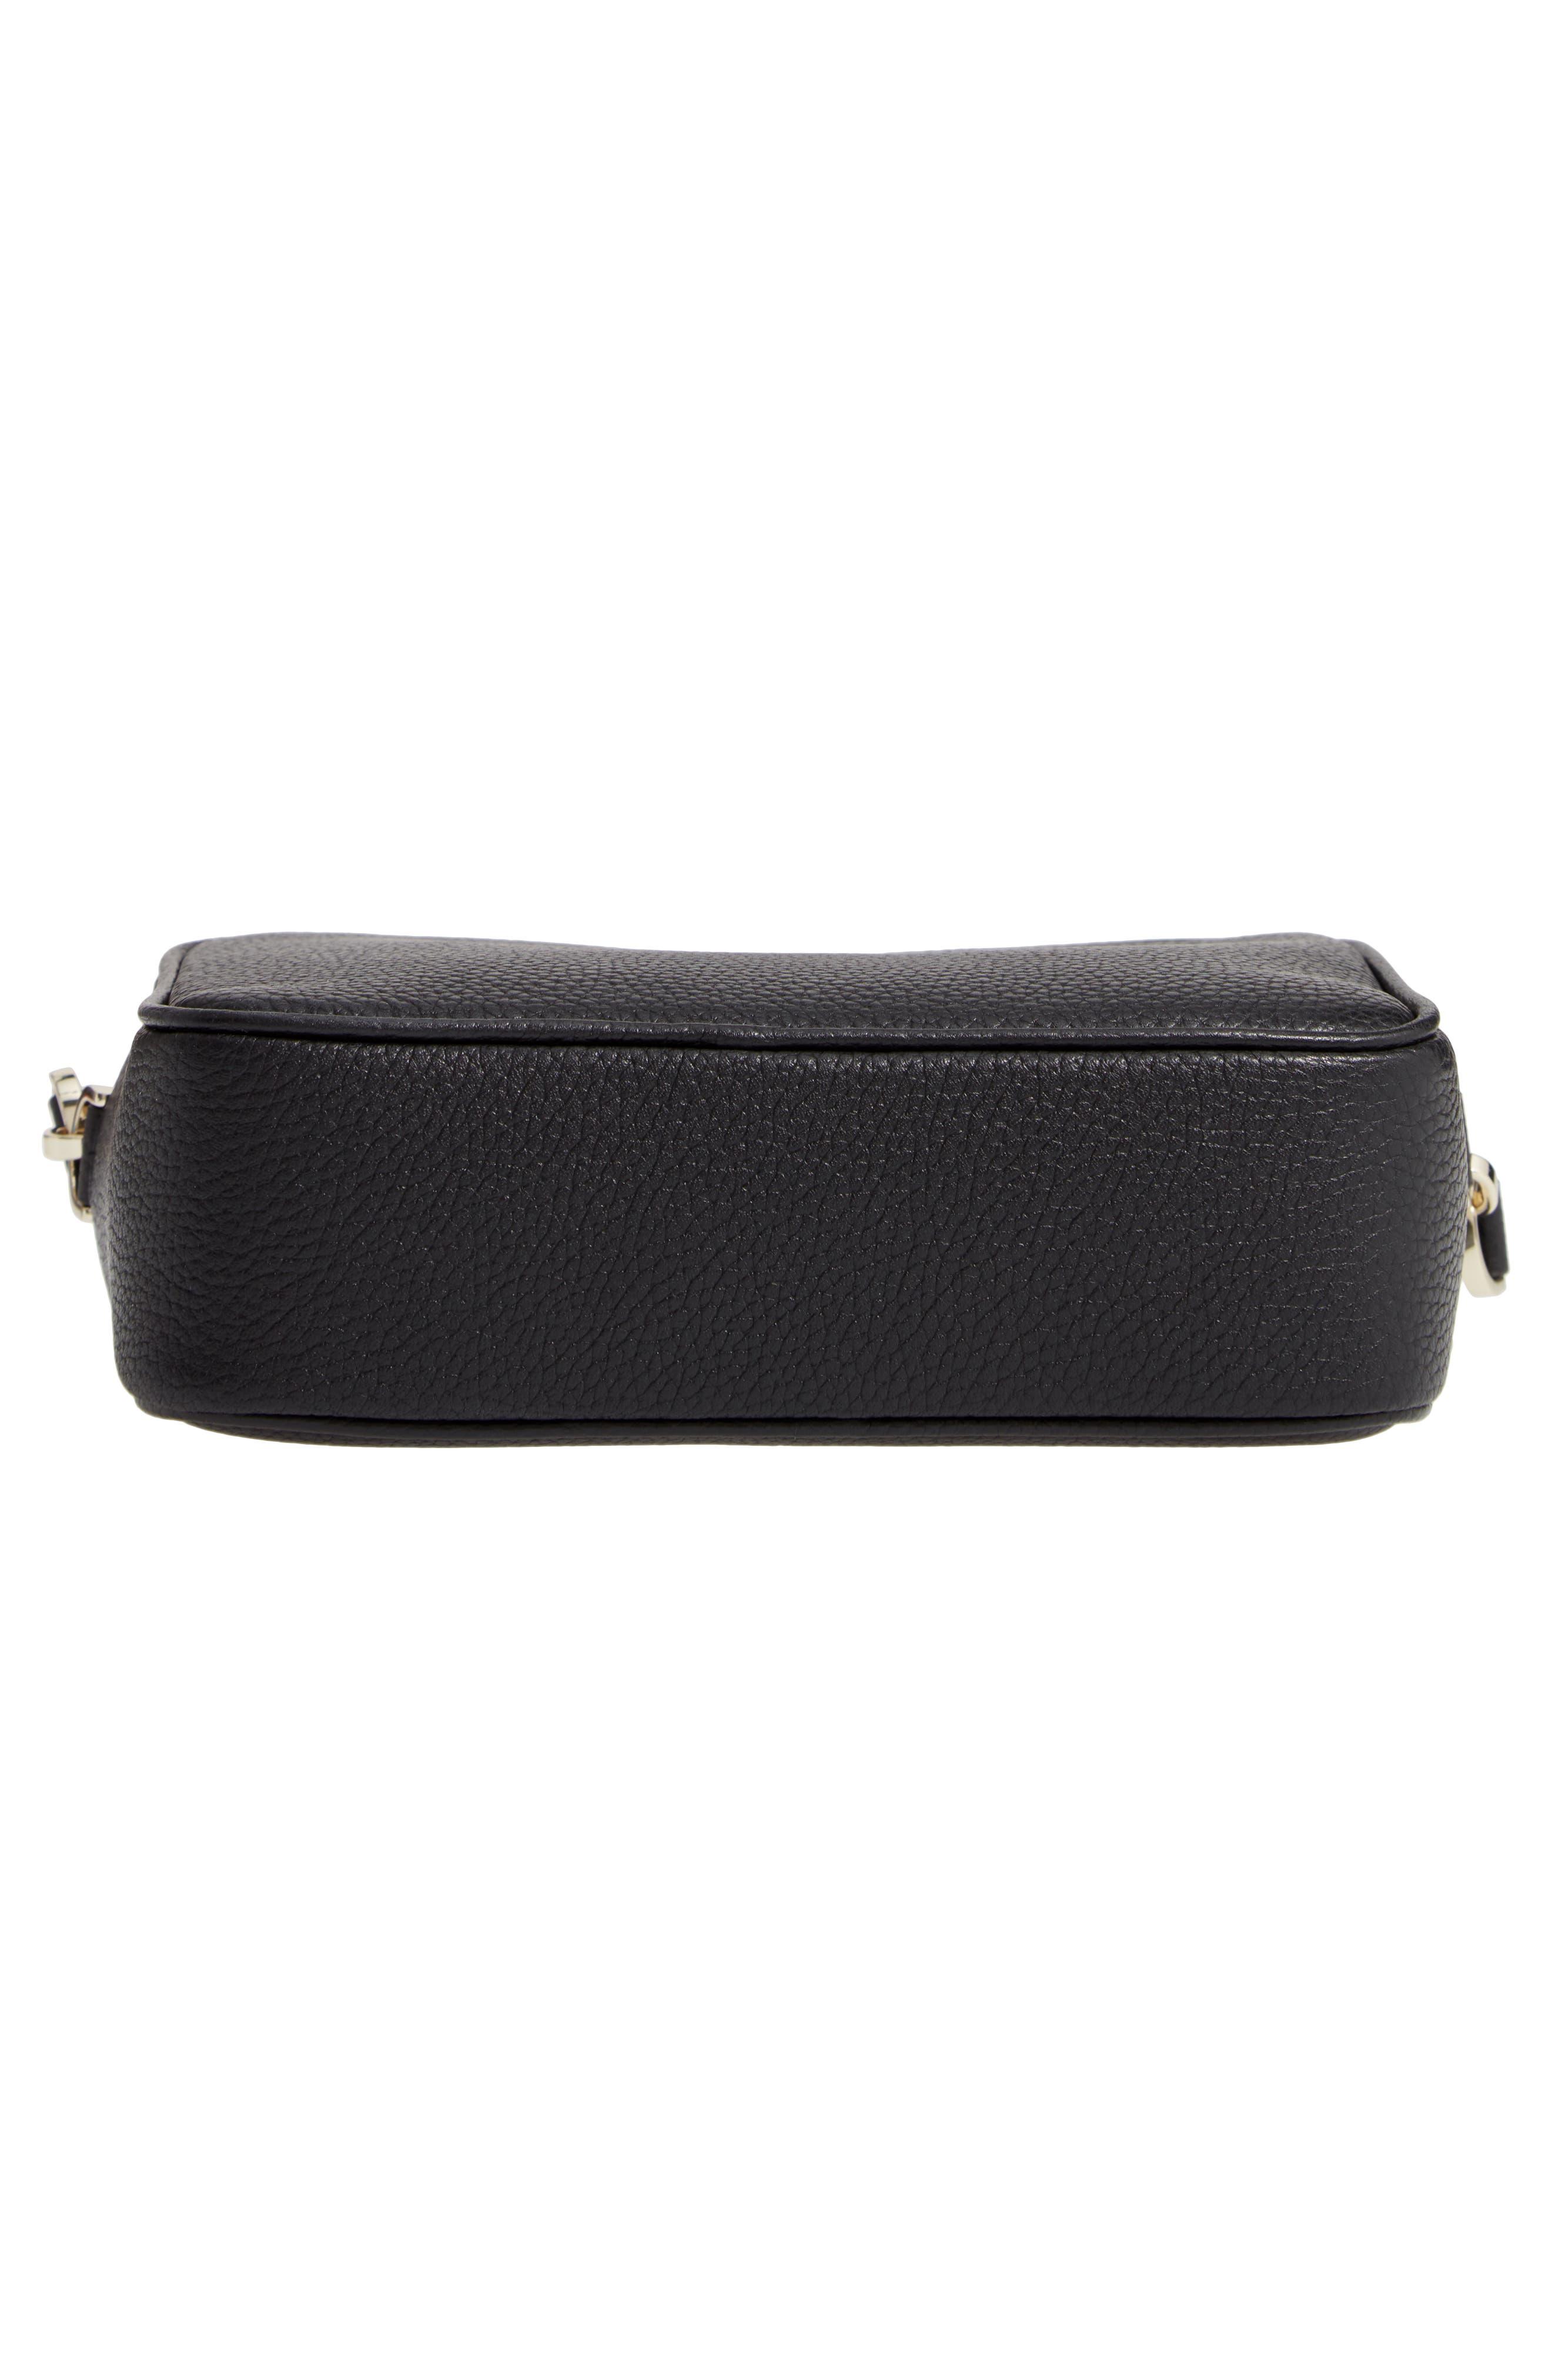 KATE SPADE NEW YORK, medium polly leather camera bag, Alternate thumbnail 7, color, BLACK